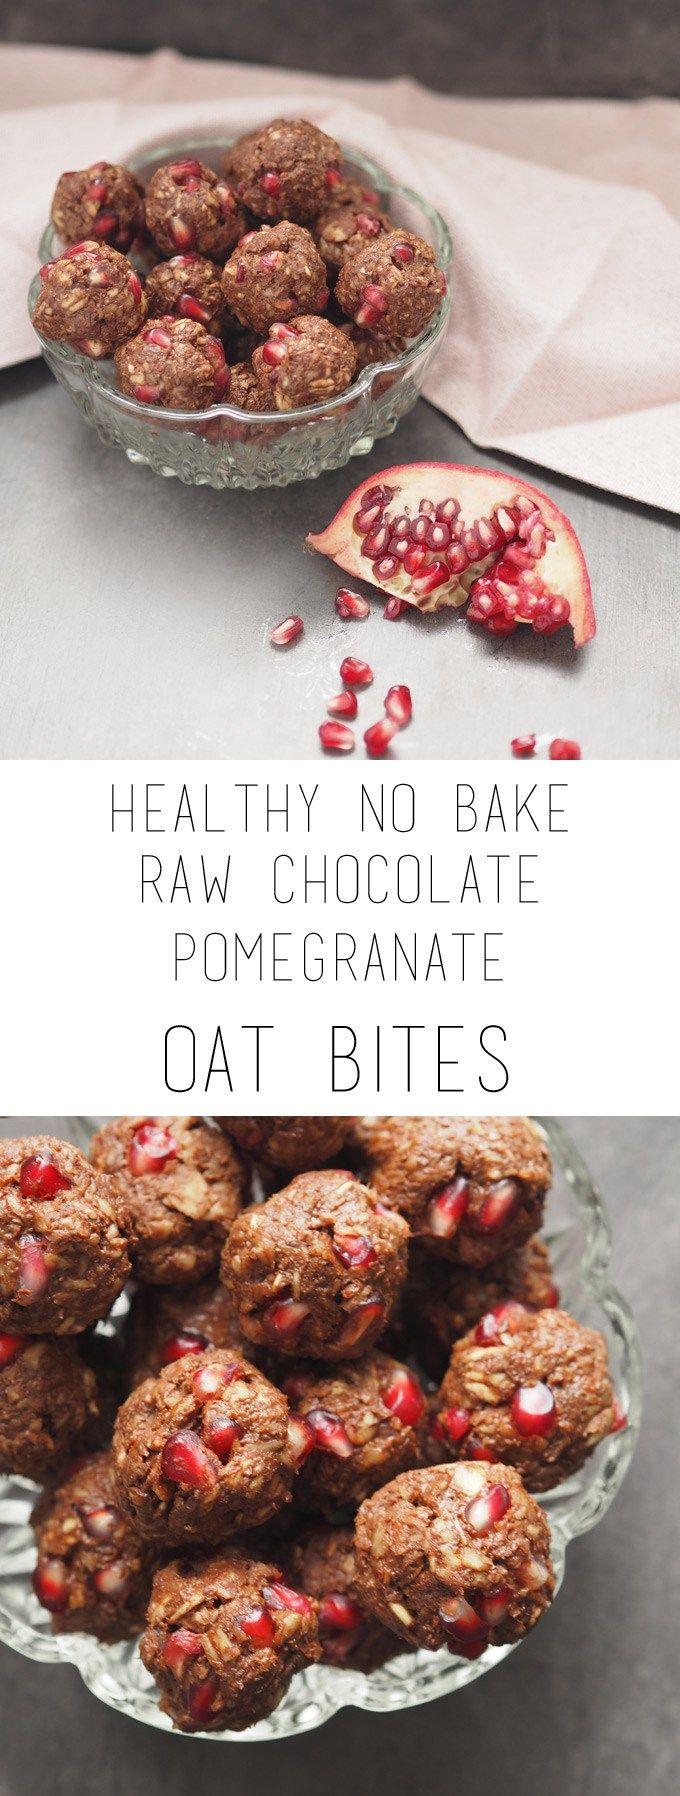 Healthy no bake raw chocolate pomegranate oat bites (sugar free, vegan)